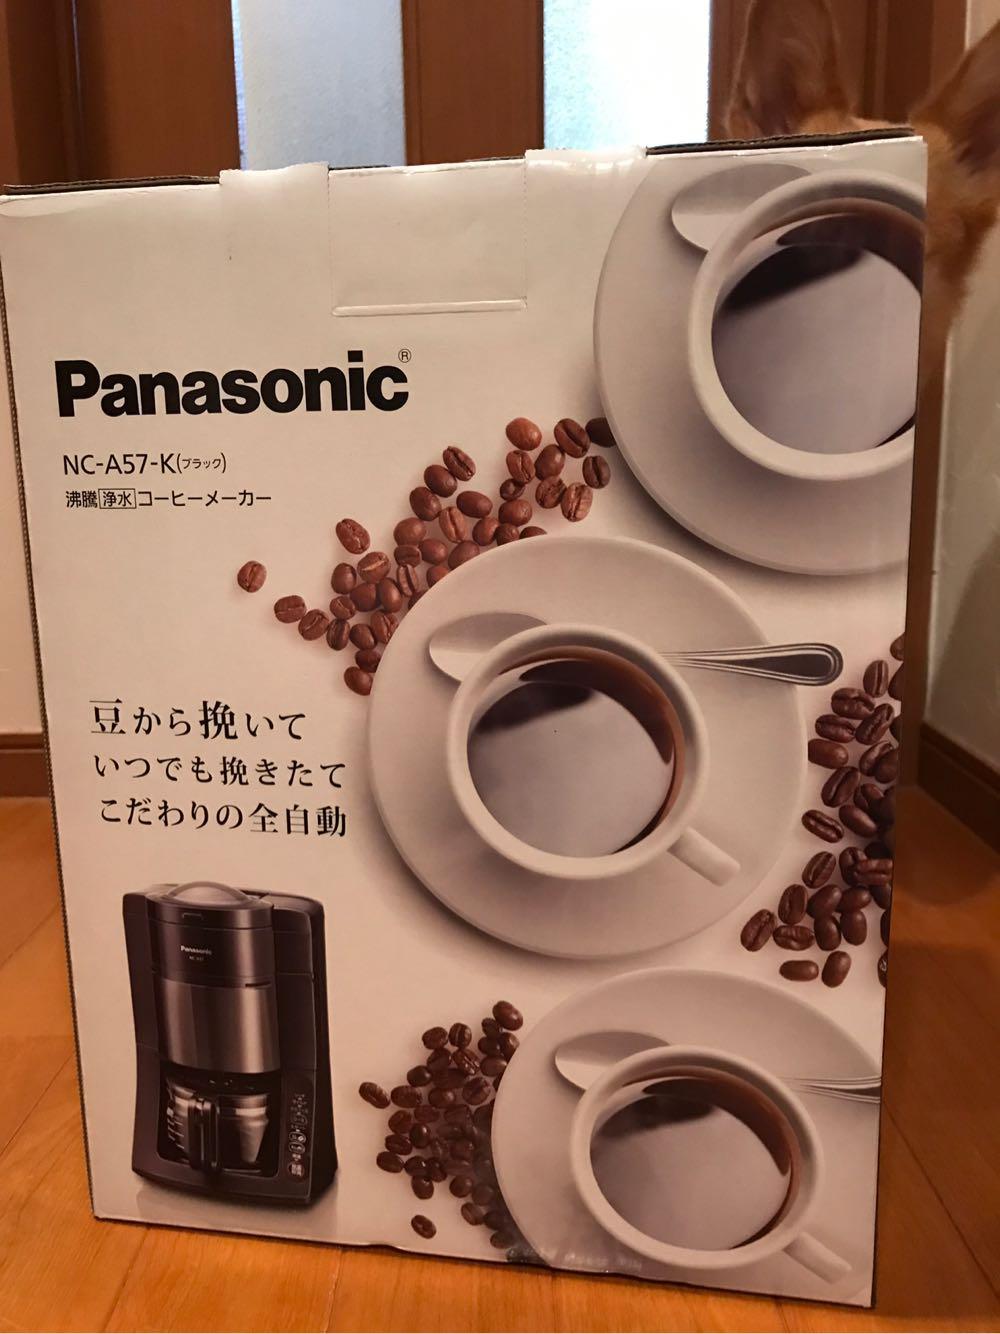 Panasonic NC-A57-K